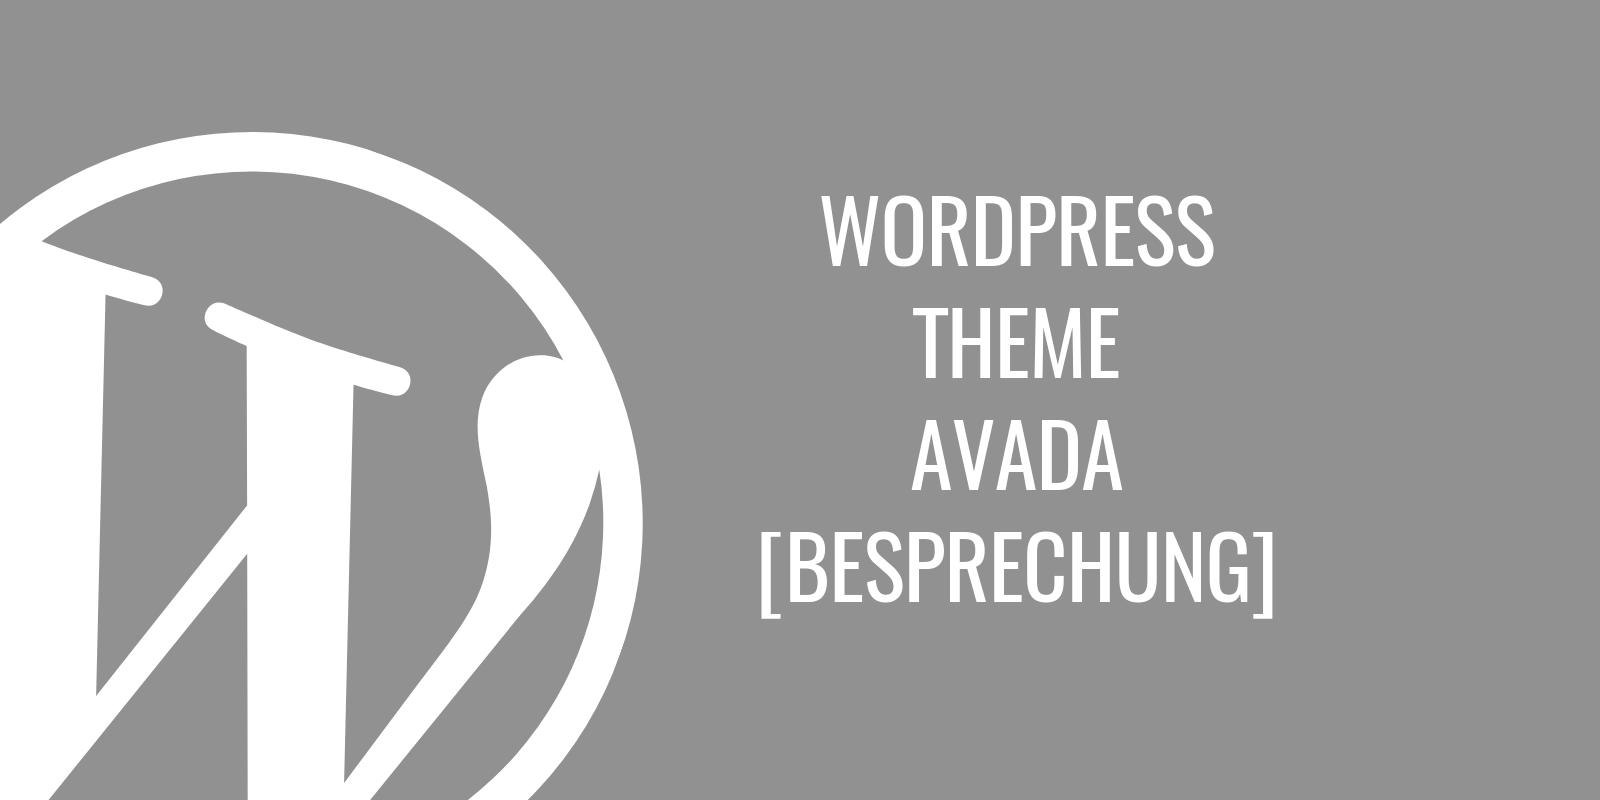 WordPress Theme Avada Besprechung